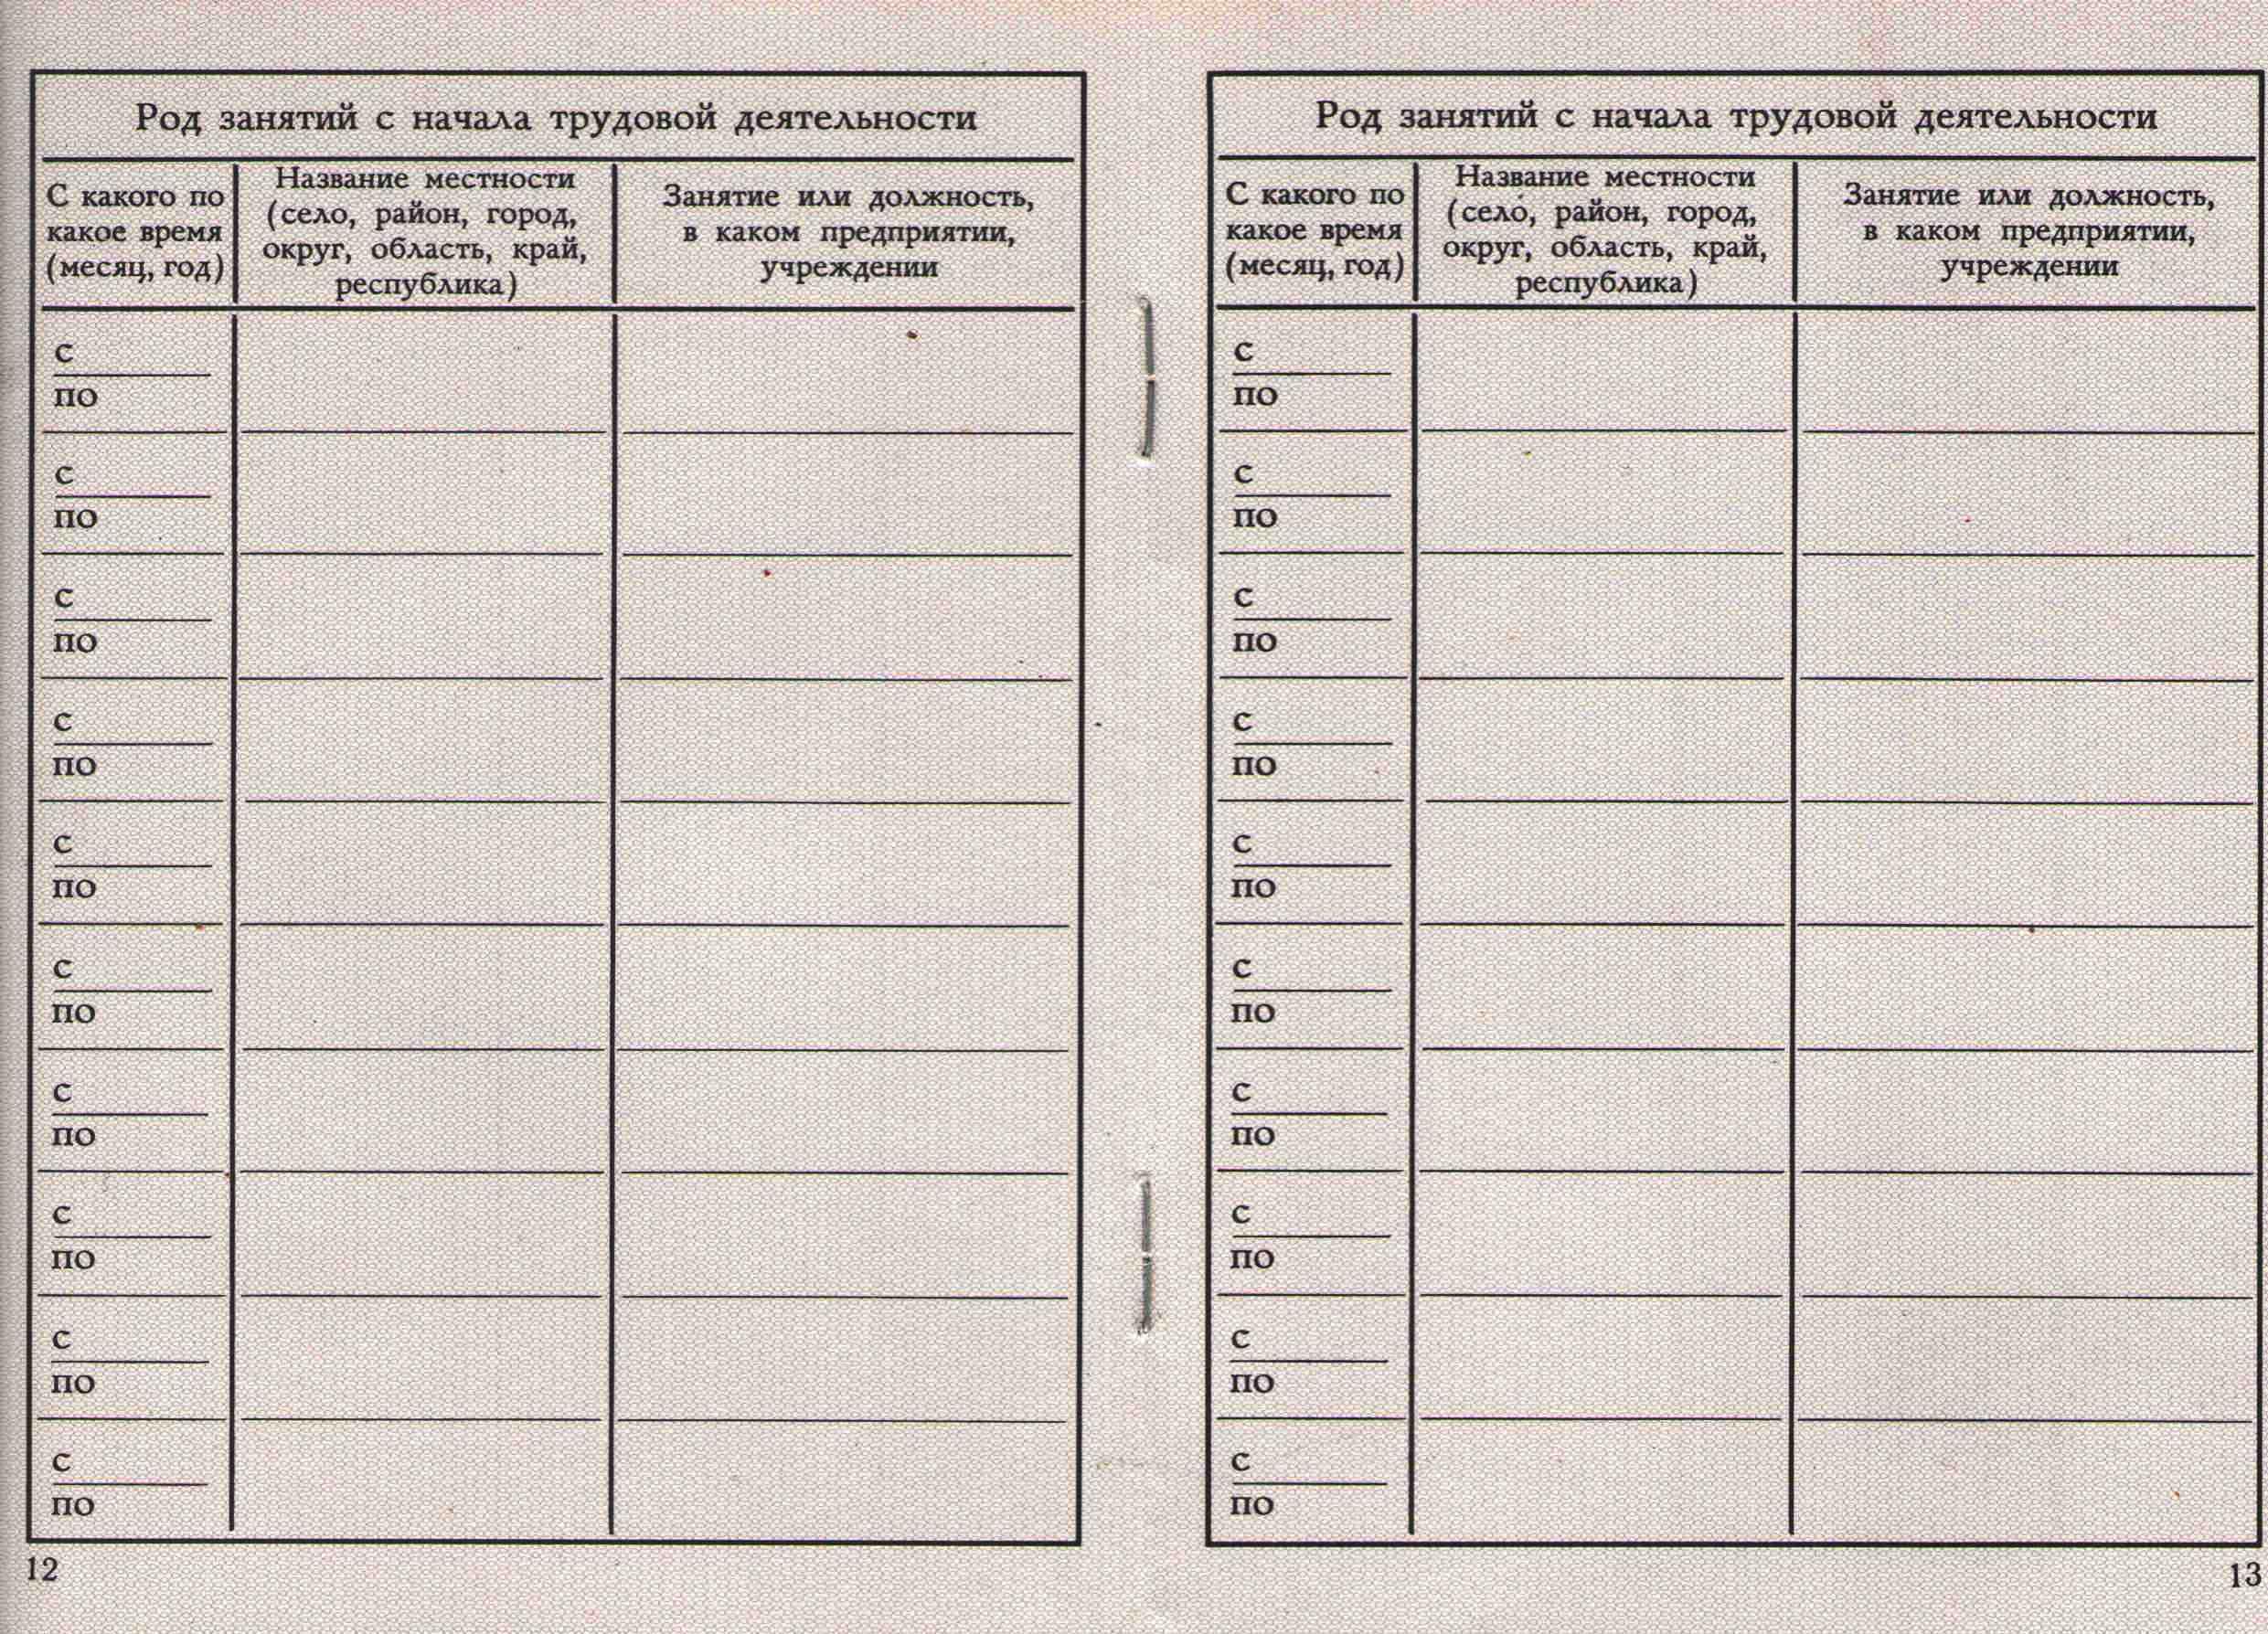 85. Учетная карточка члена партии Барыкина ПП, 1974.